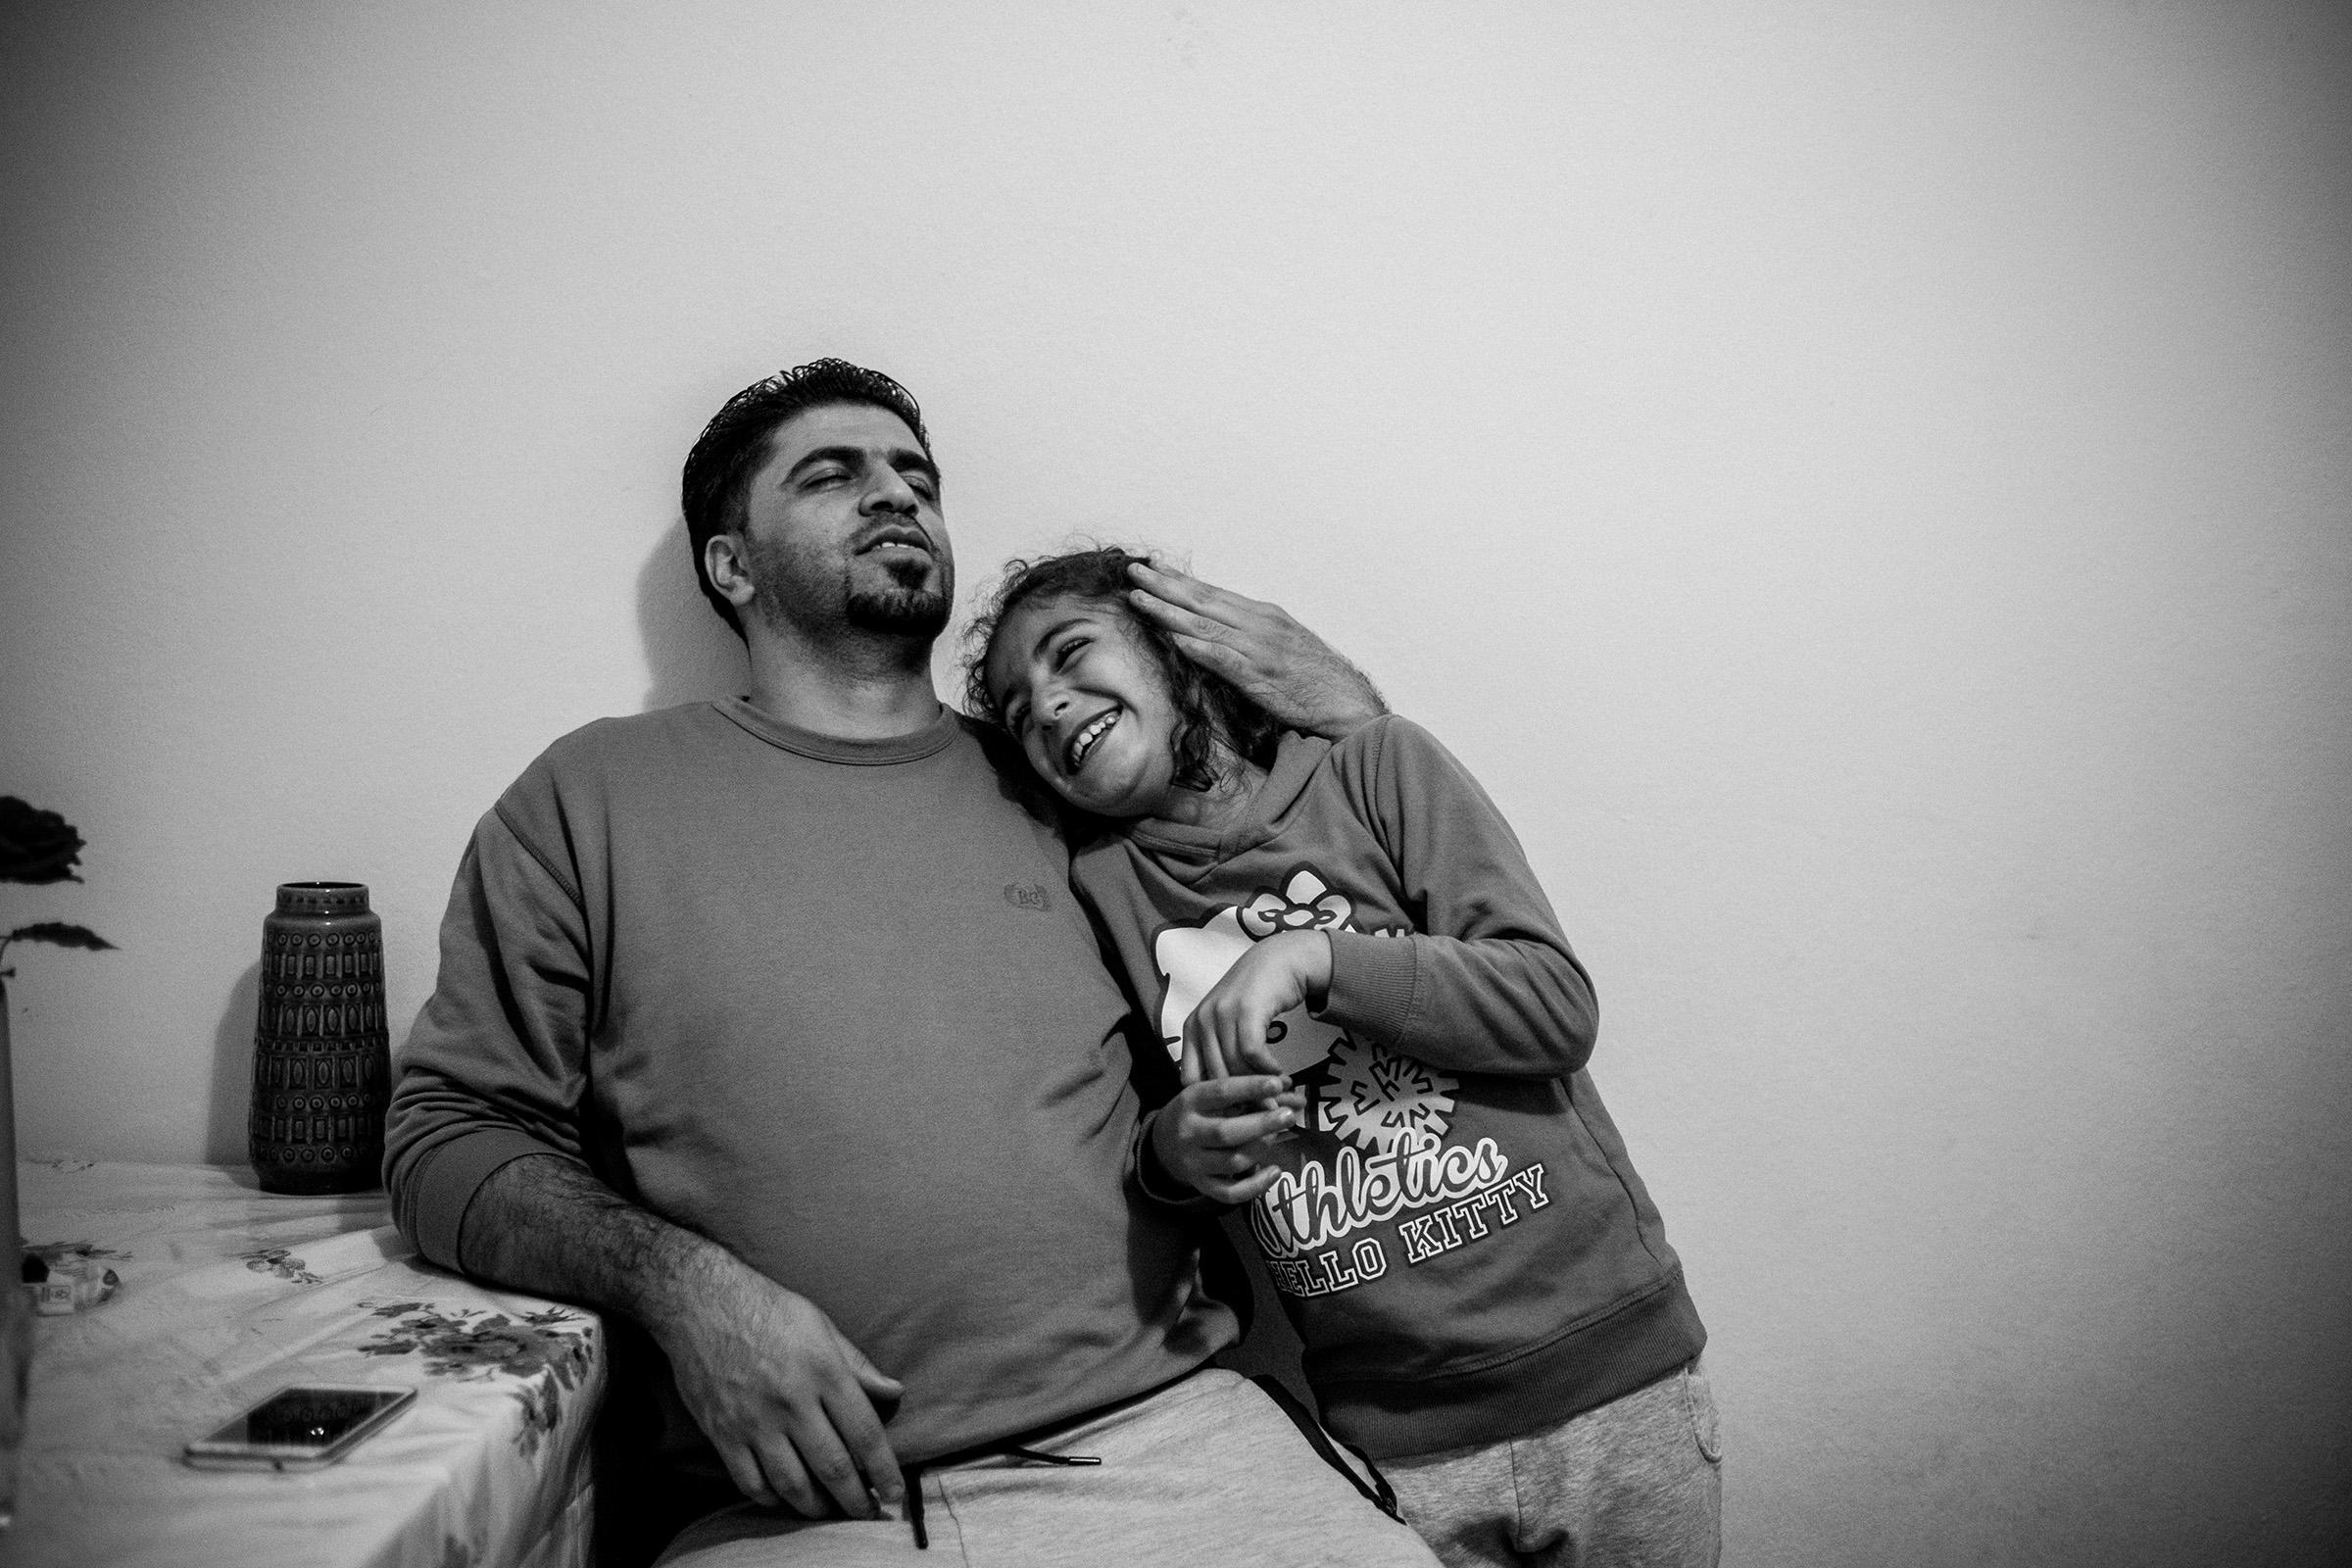 fluechtlinge-syrien-berlin-asyl-integration-lachen